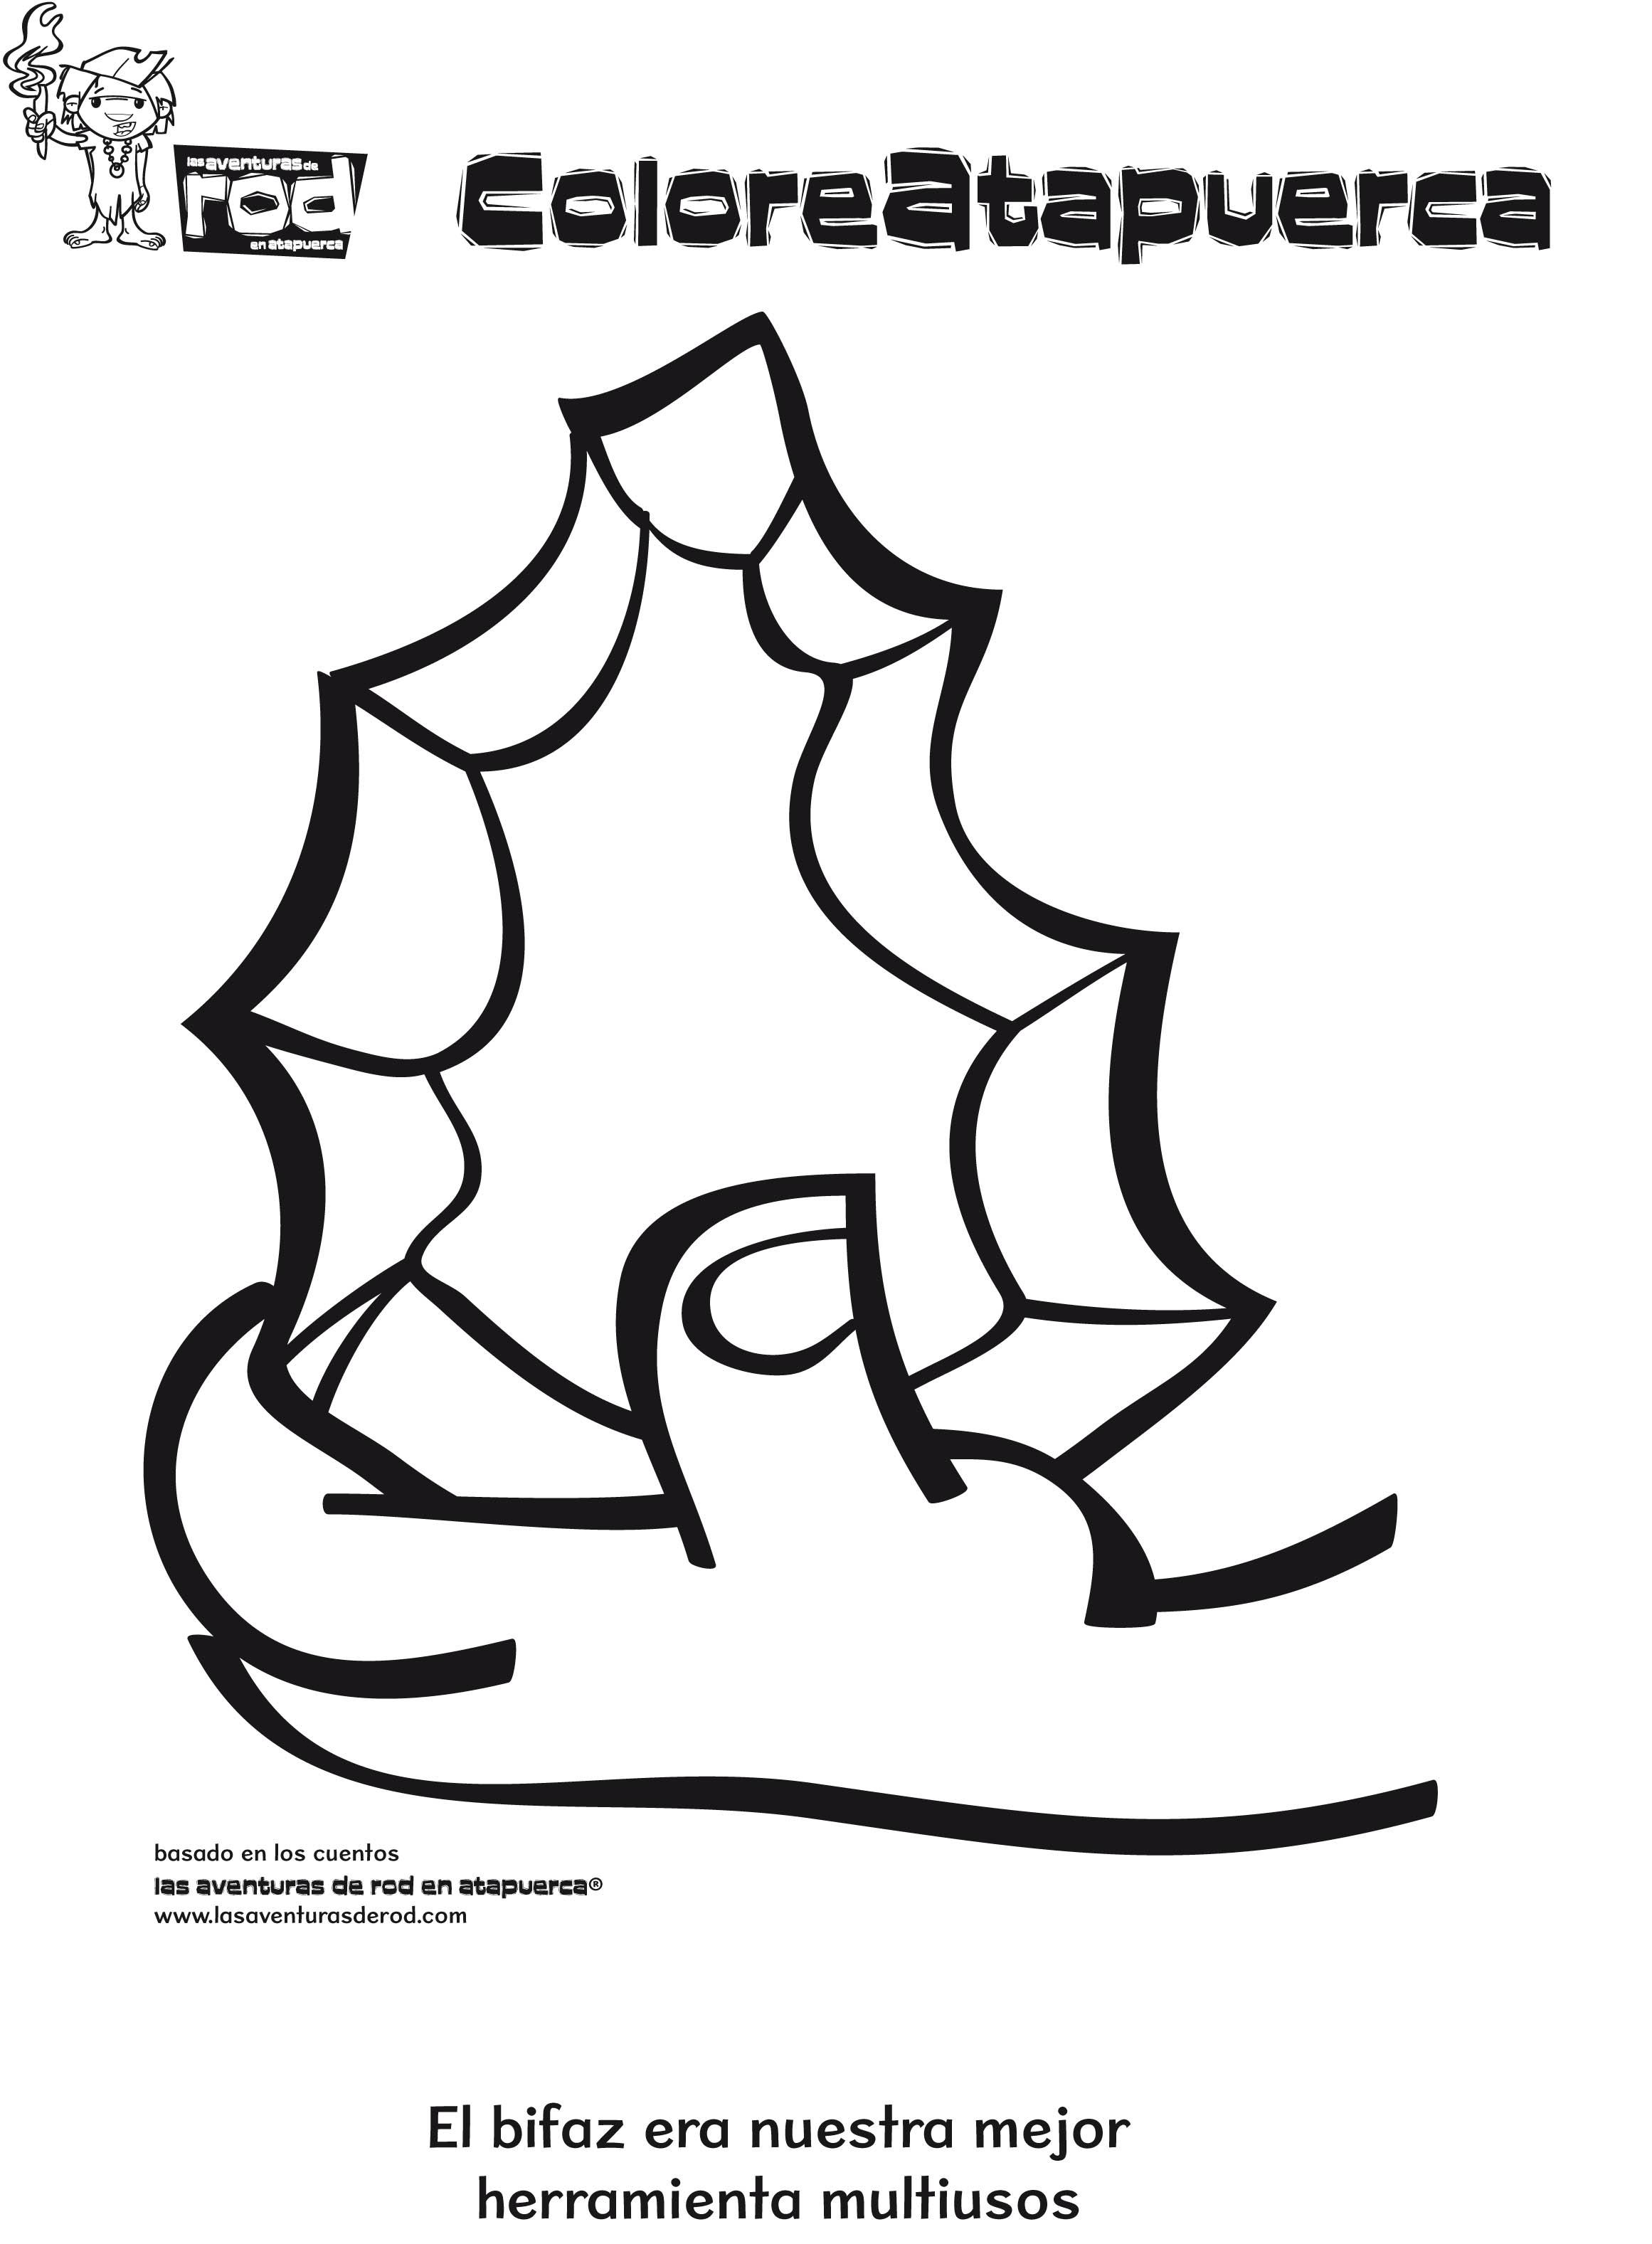 Descarga dibujos para colorear de Las Aventuras de Rod en Atapuerca